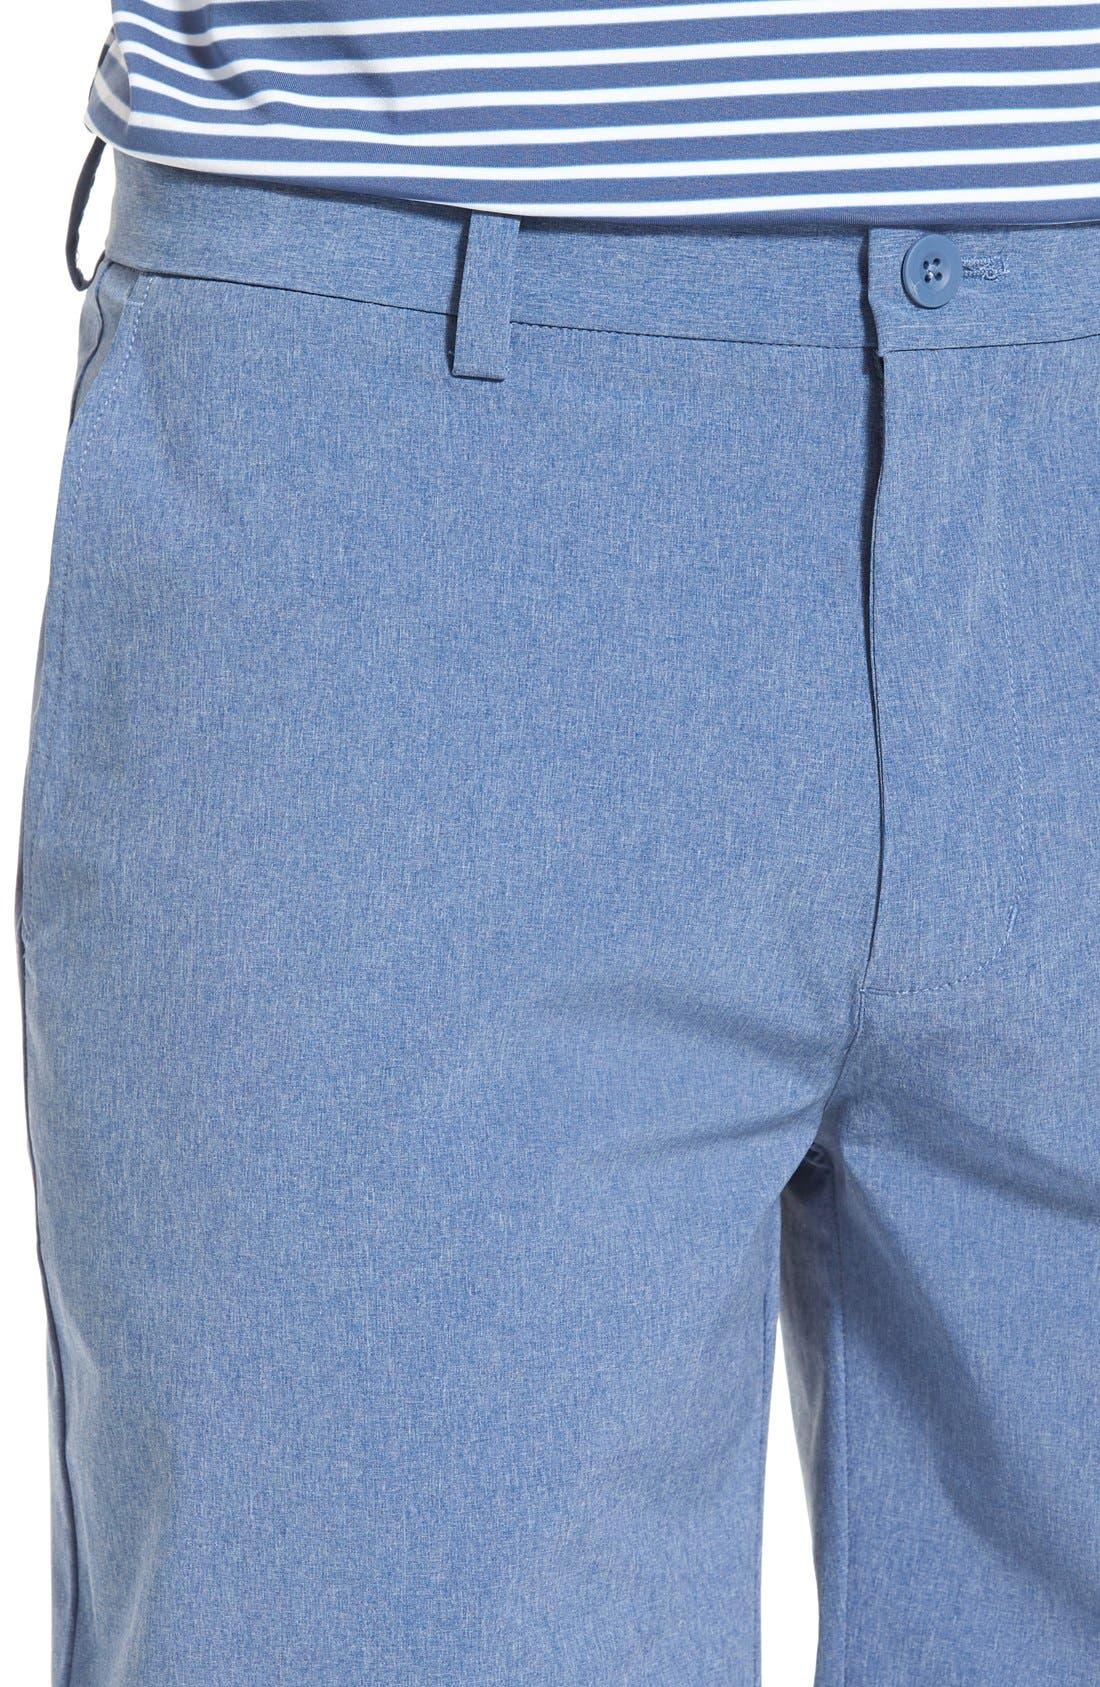 8 Inch Performance Breaker Shorts,                             Alternate thumbnail 68, color,